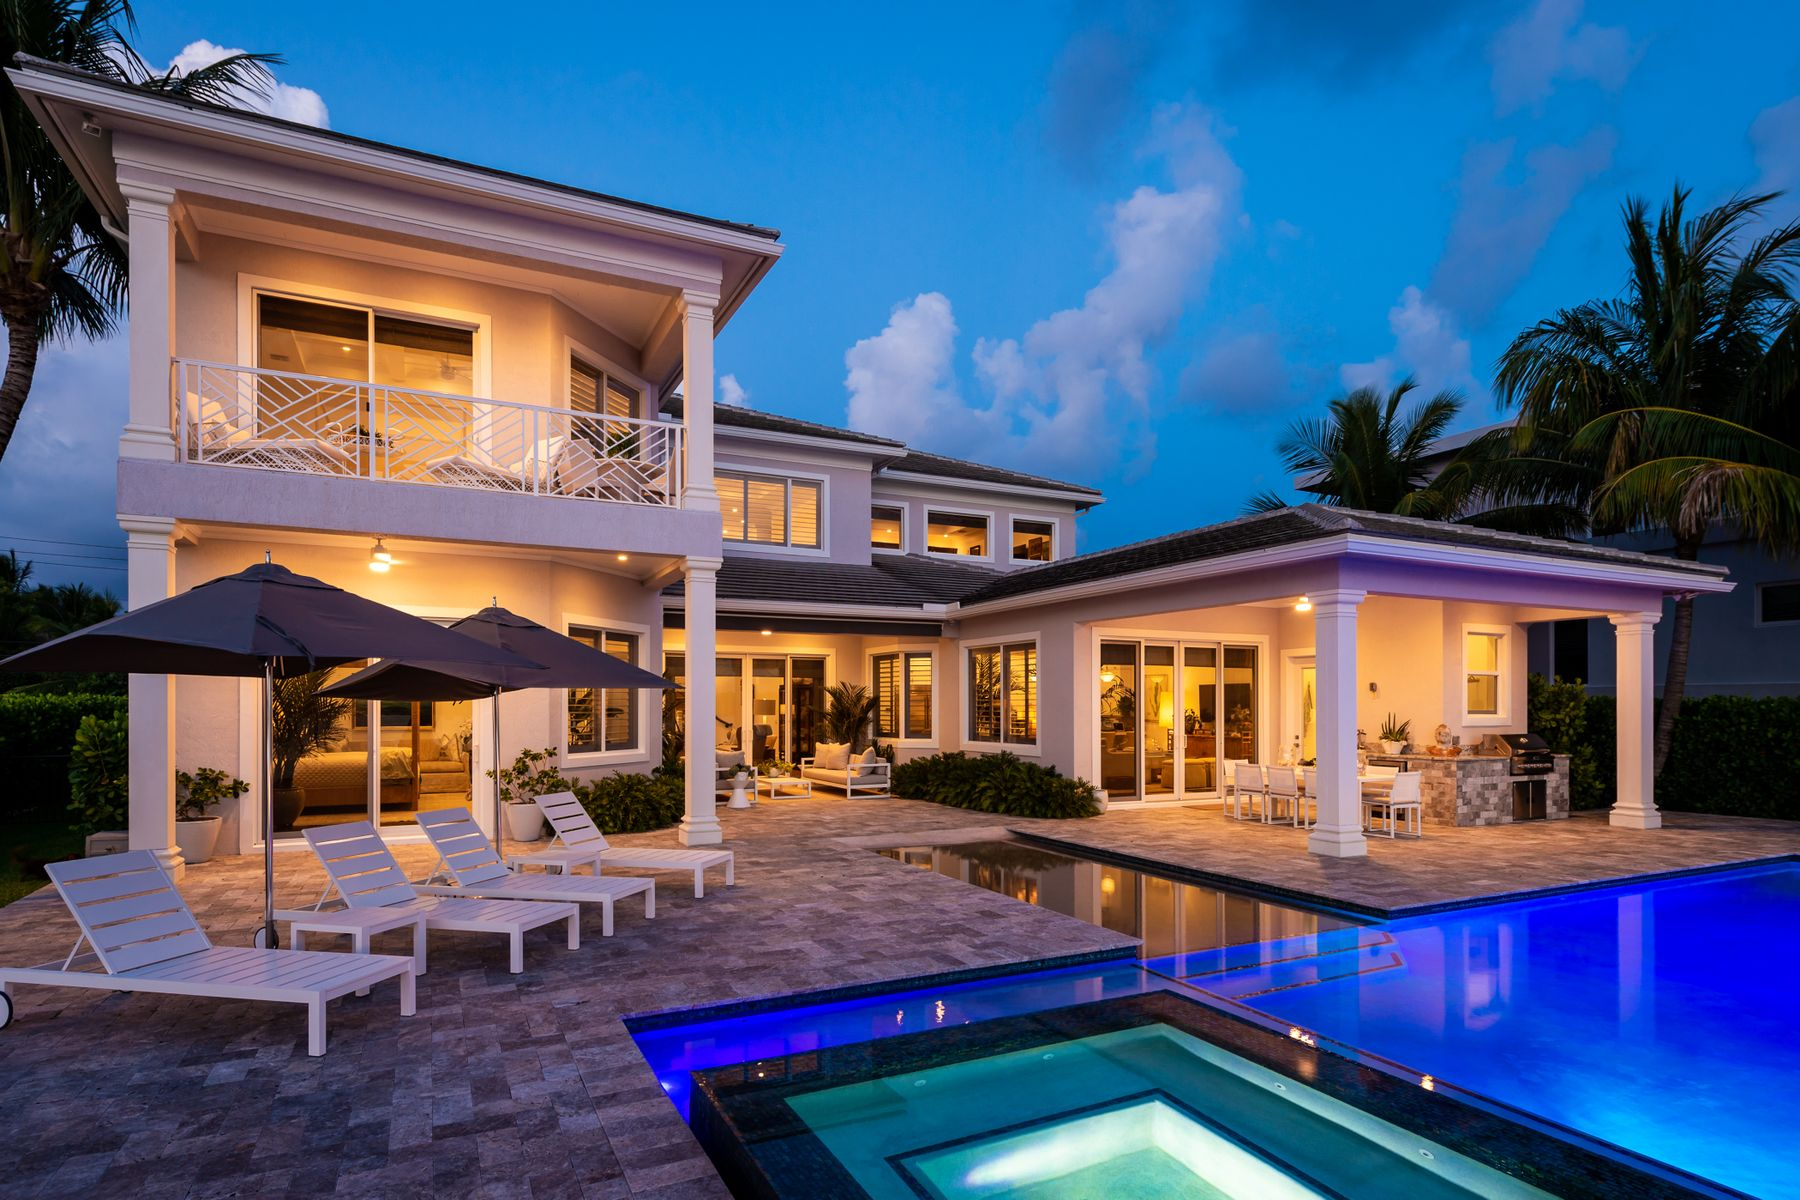 Single Family Homes for Active at 317 S Atlantic Drive 317 S Atlantic Dr Lantana, Florida 33462 United States